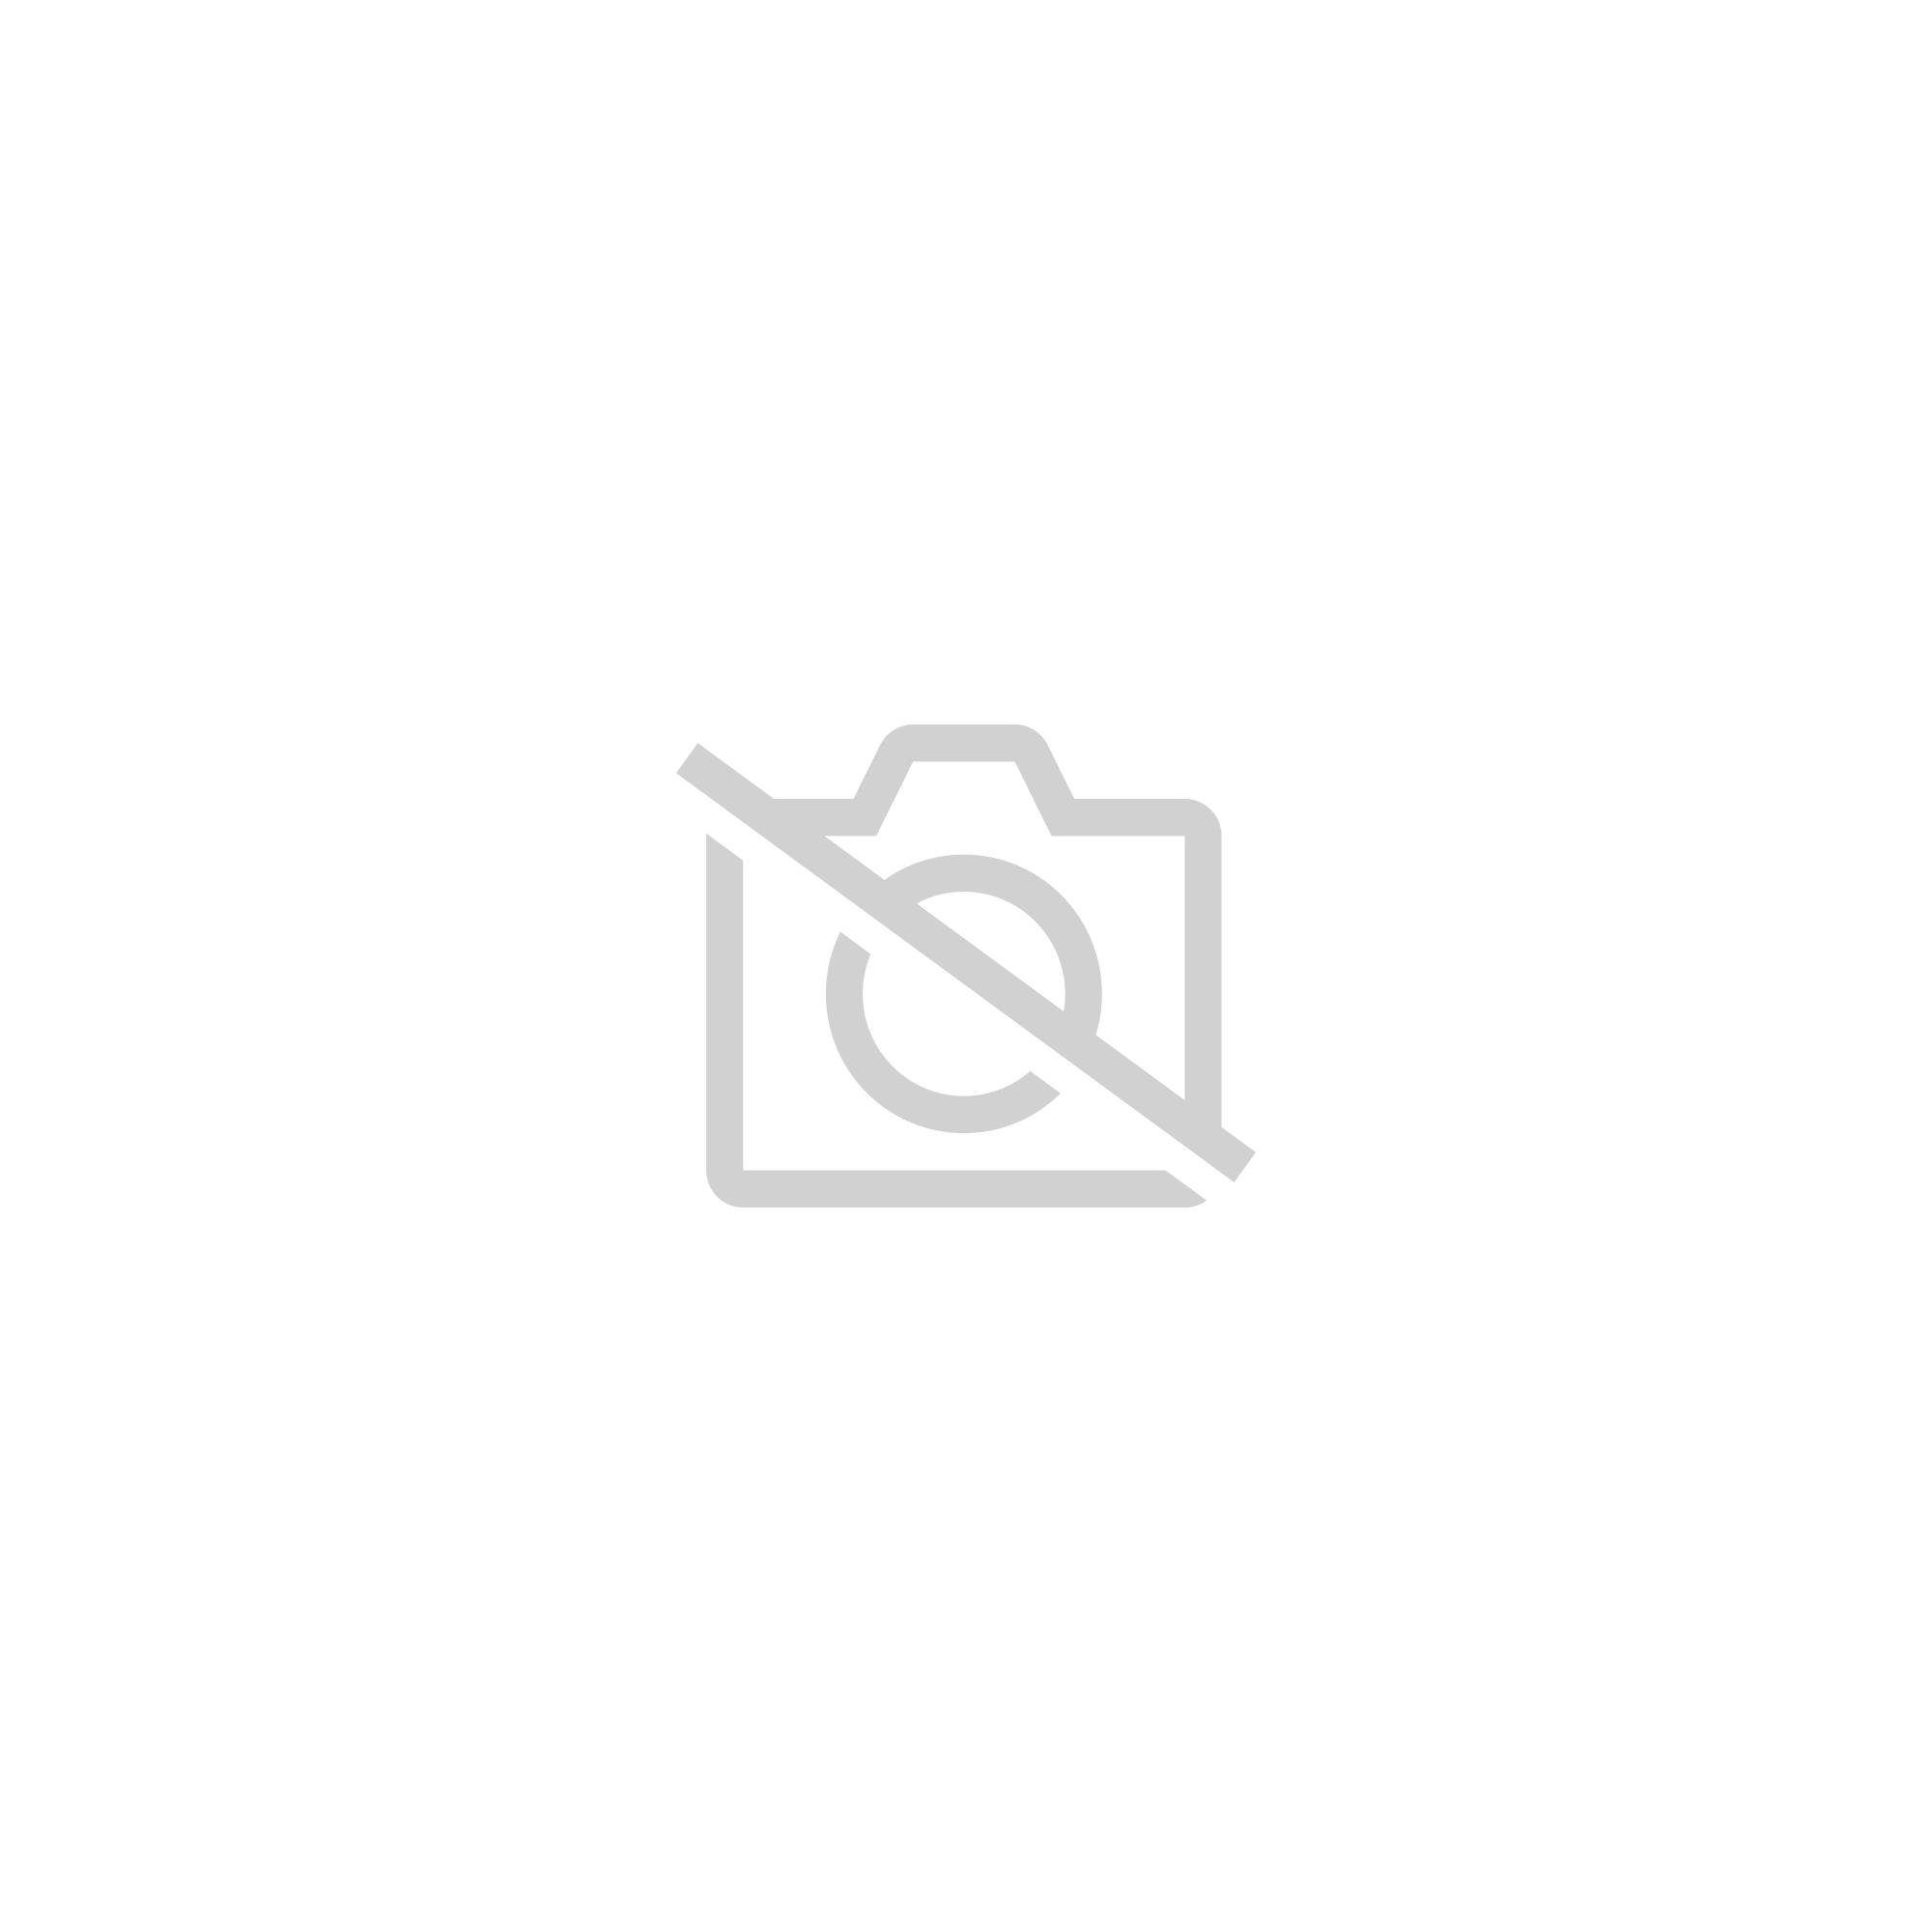 fallback-no-image-229223